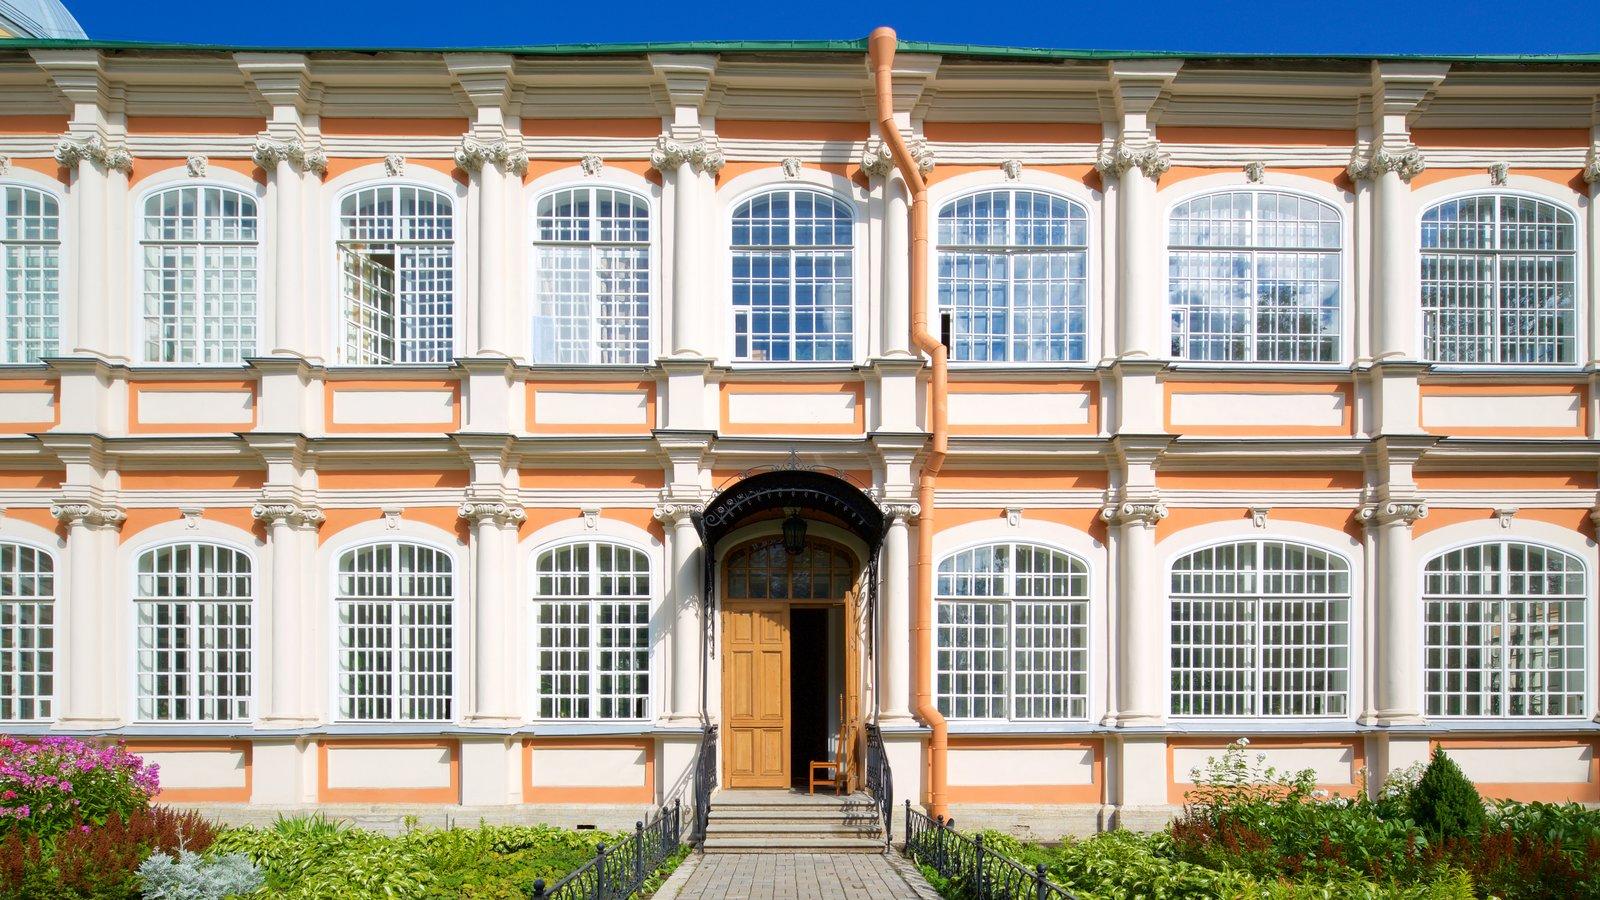 Alexander Nevsky Lavra caracterizando arquitetura de patrimônio